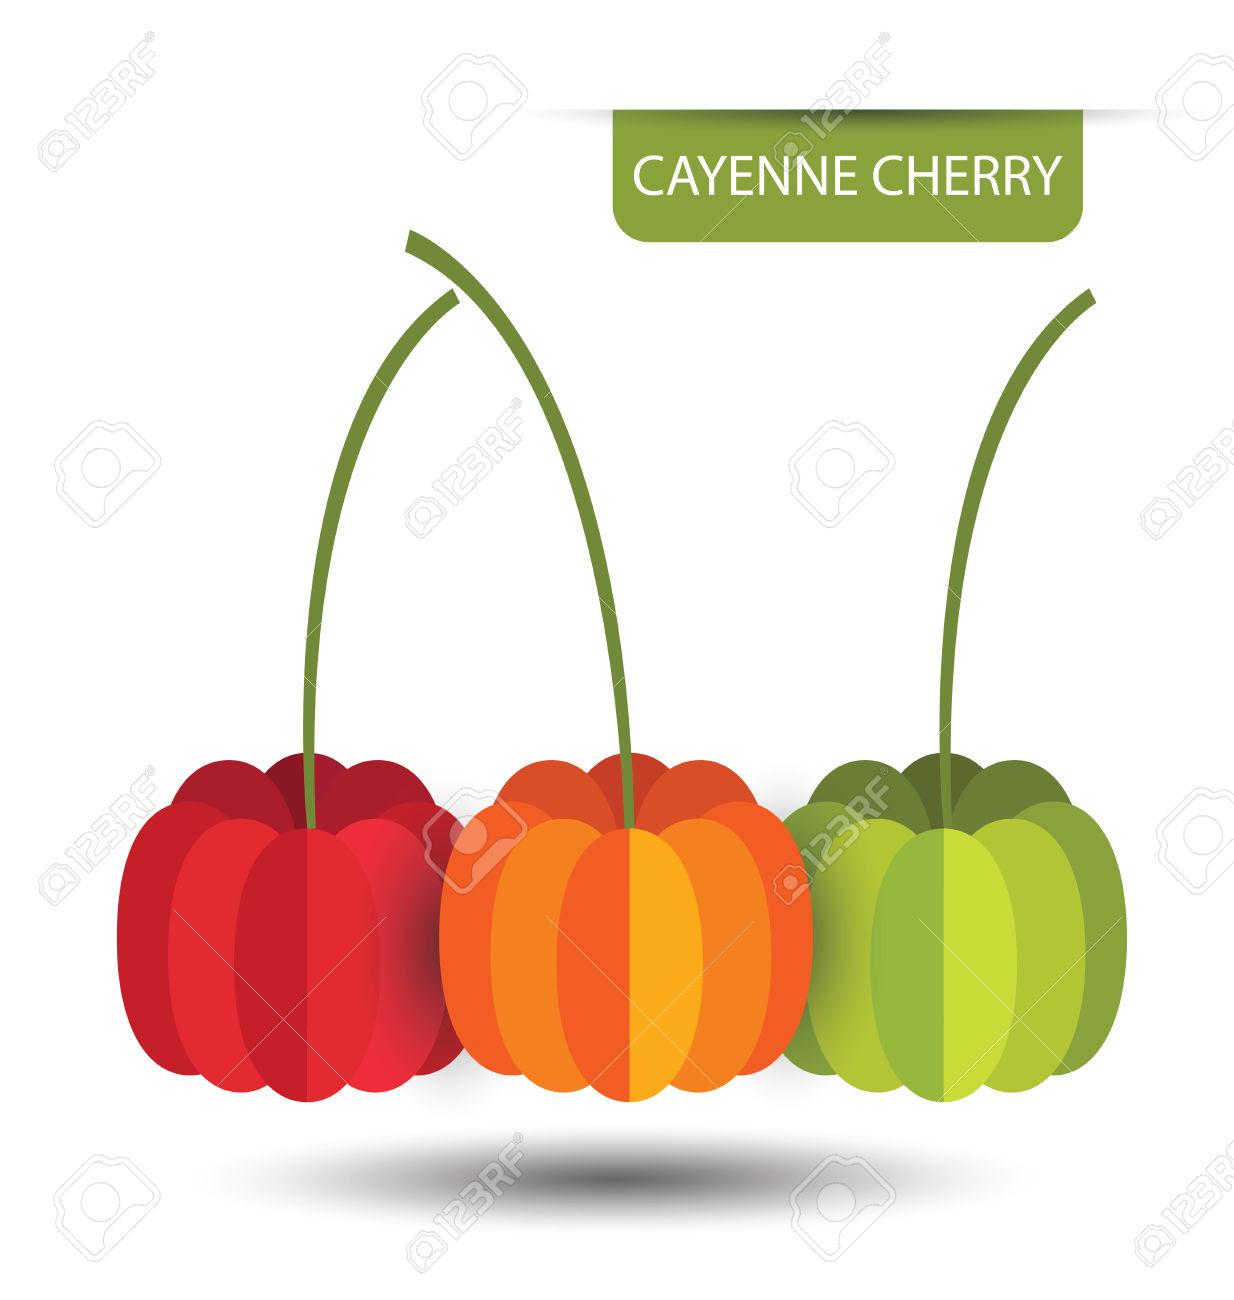 Pitanga Cherry, Fruit Vector Illustration Royalty Free Cliparts.